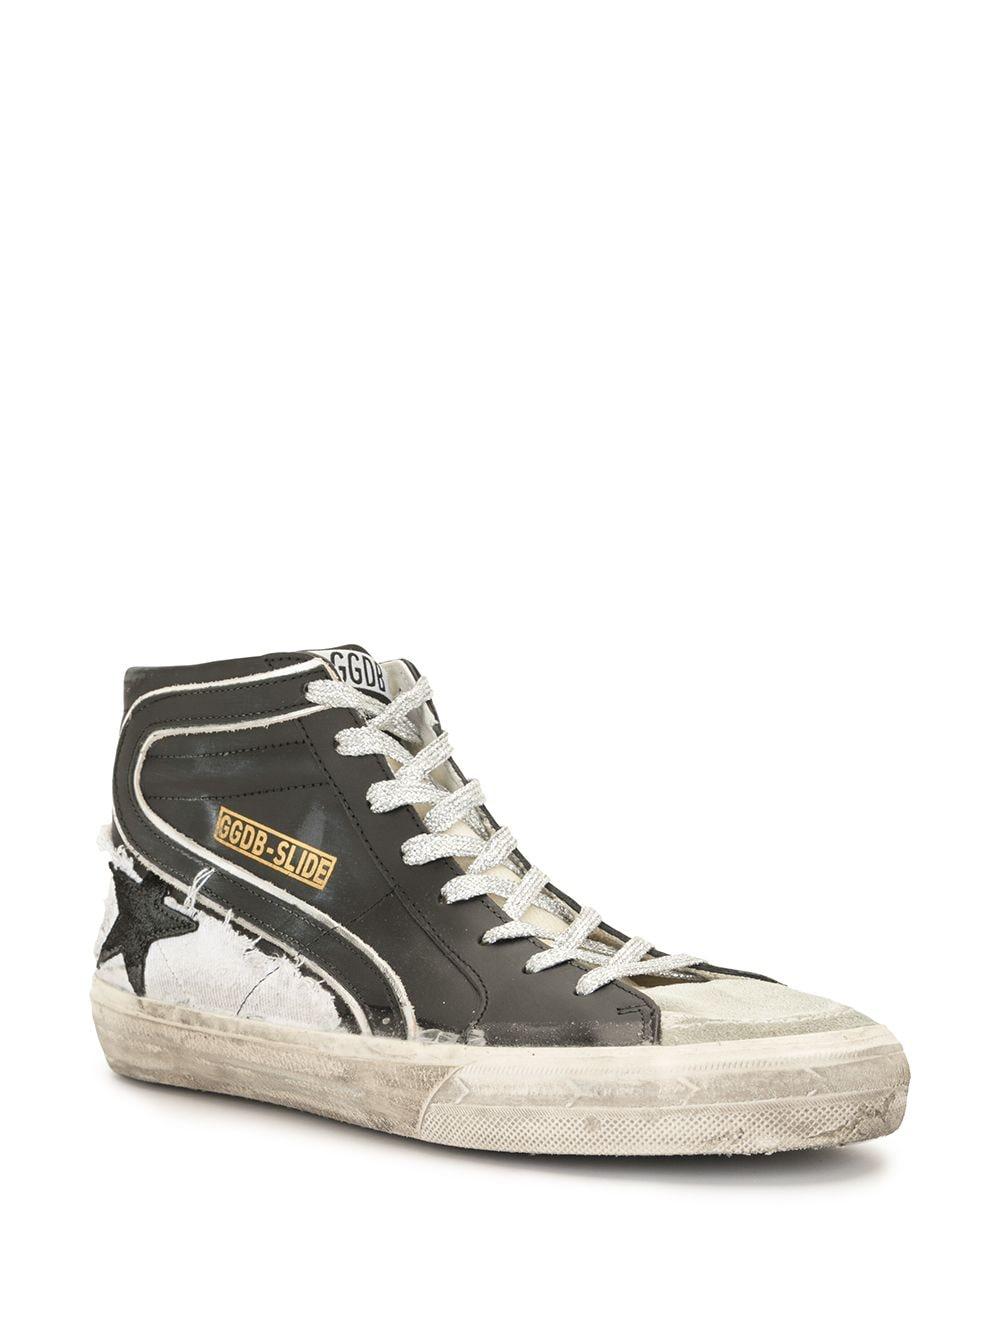 Picture of Golden Goose Deluxe Brand   Slide High-Top Sneakers